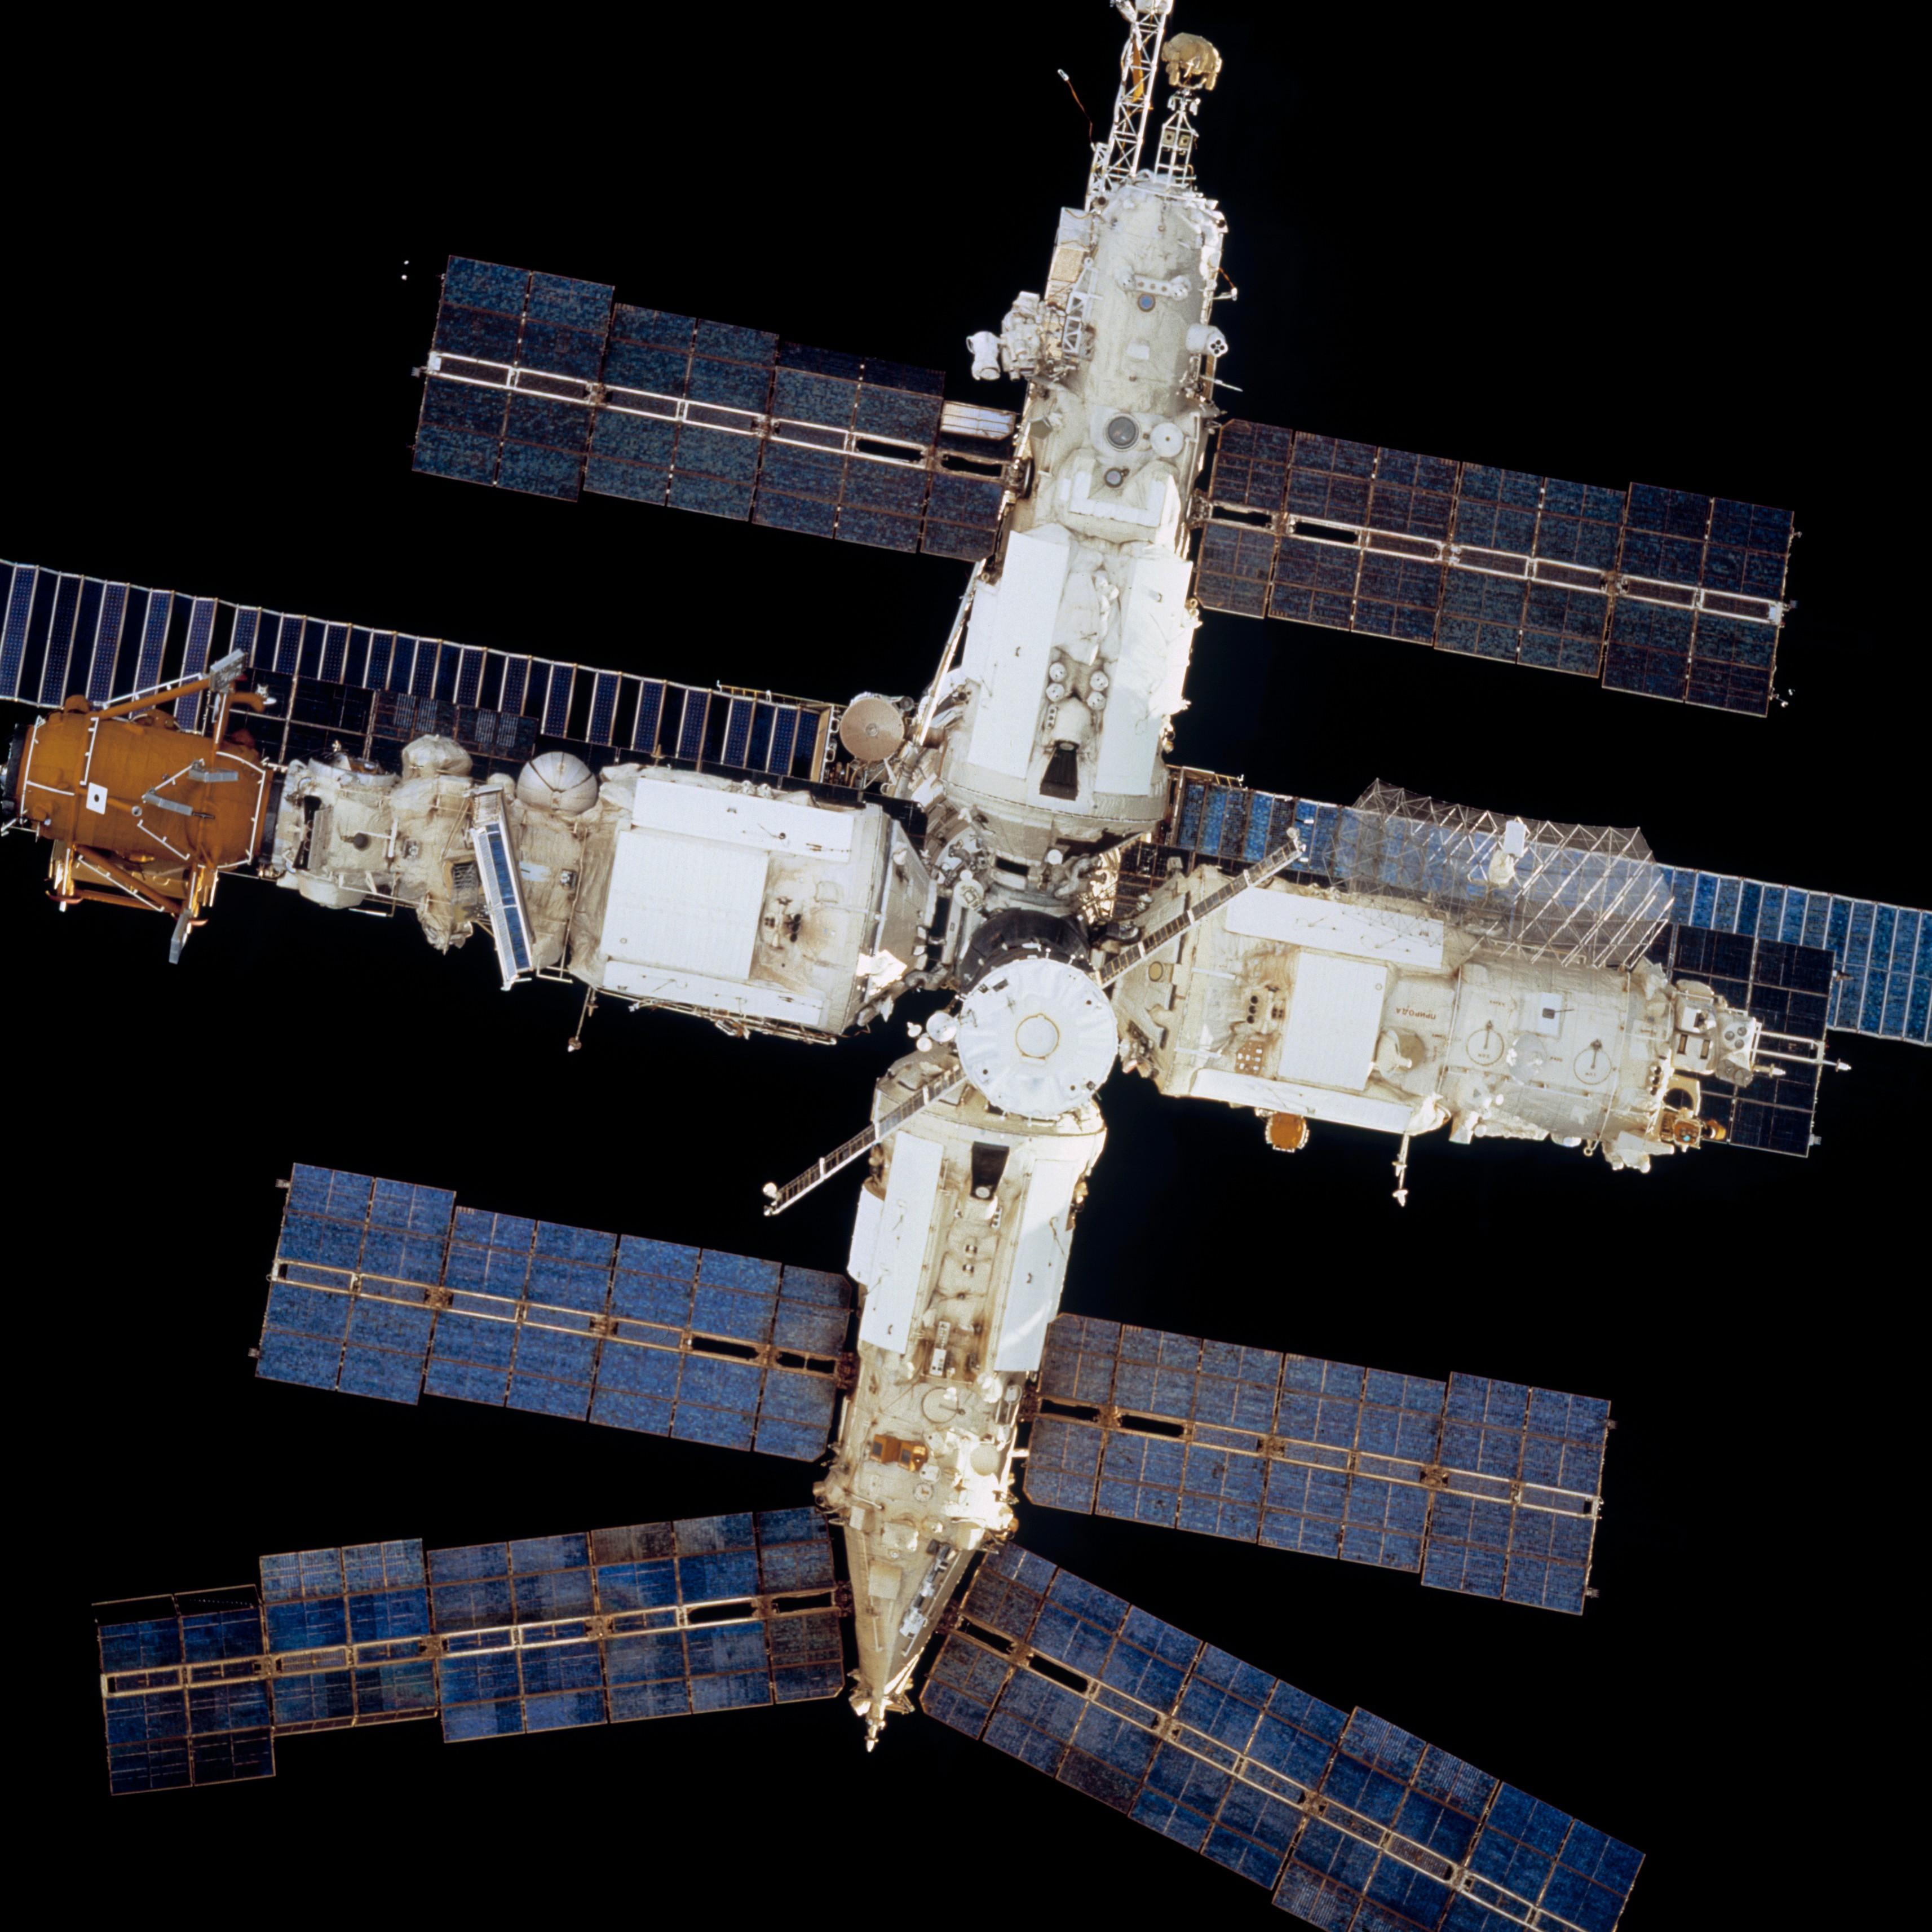 Survey Views Of The Mir Space Station Taken After Undocking Nasa